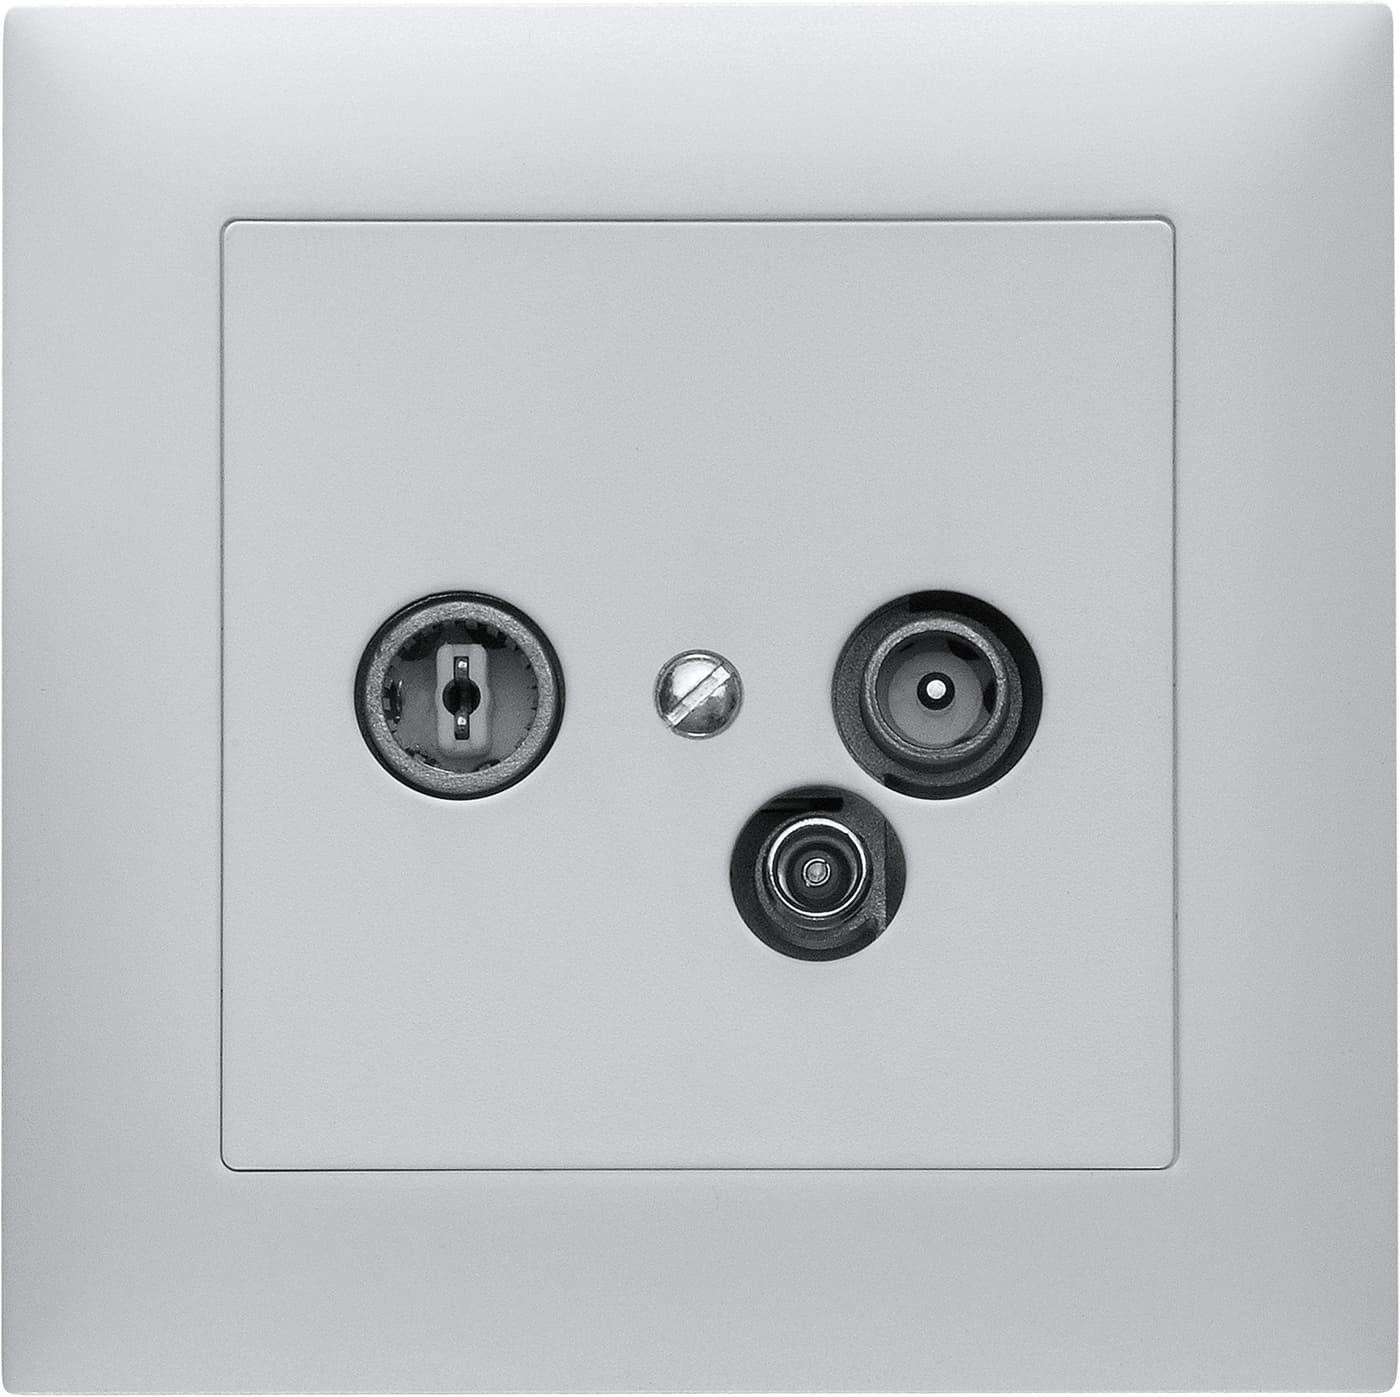 feller edizio due antennen steckdose radio tv daten migros. Black Bedroom Furniture Sets. Home Design Ideas